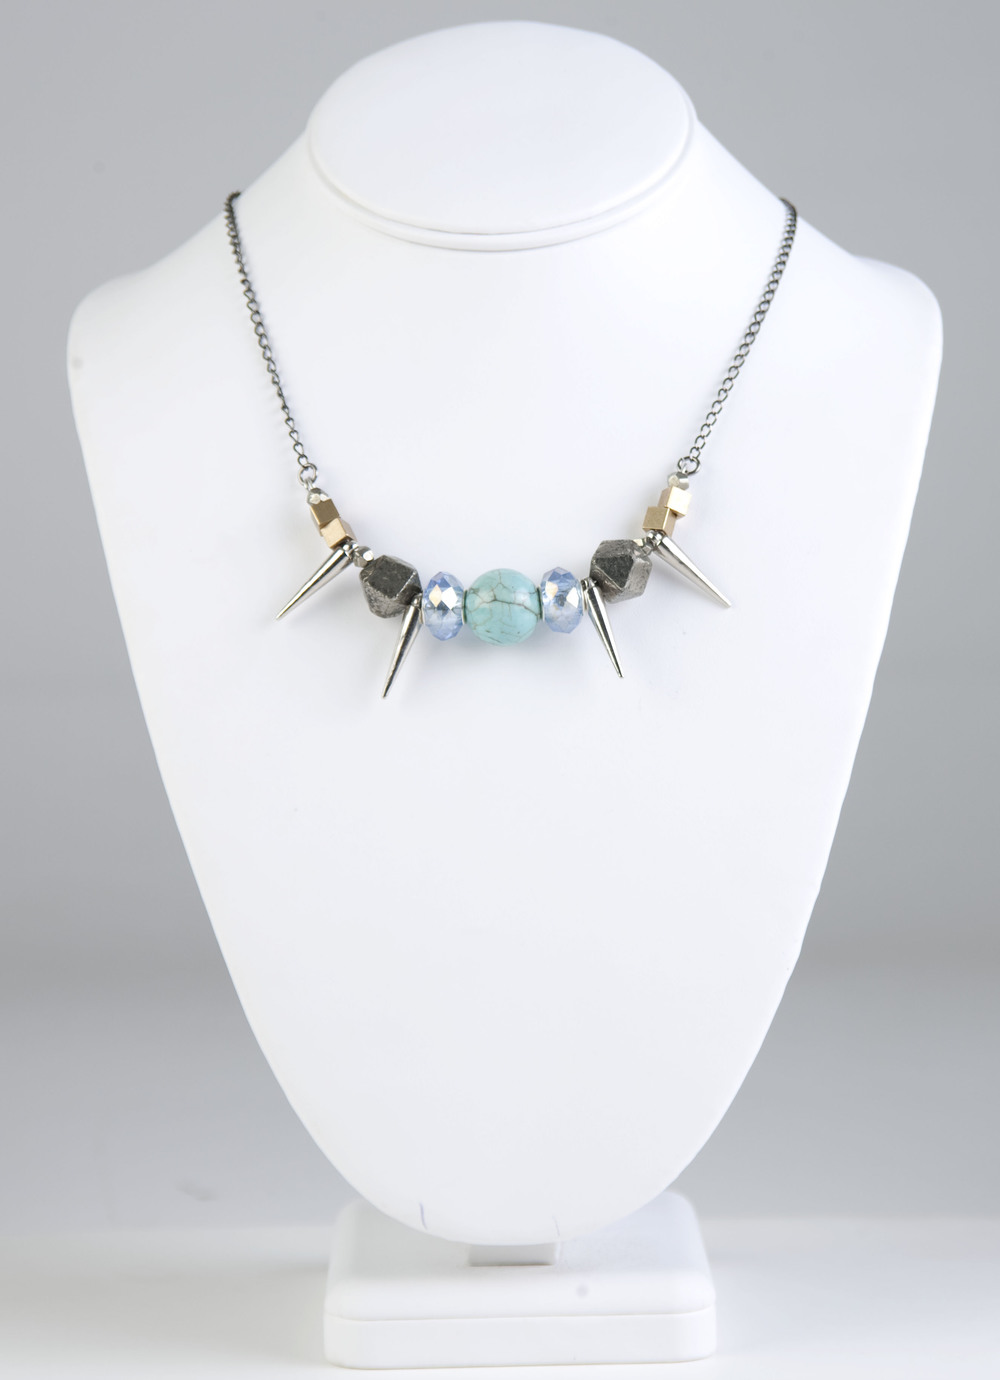 8020spike necklace 1.jpg